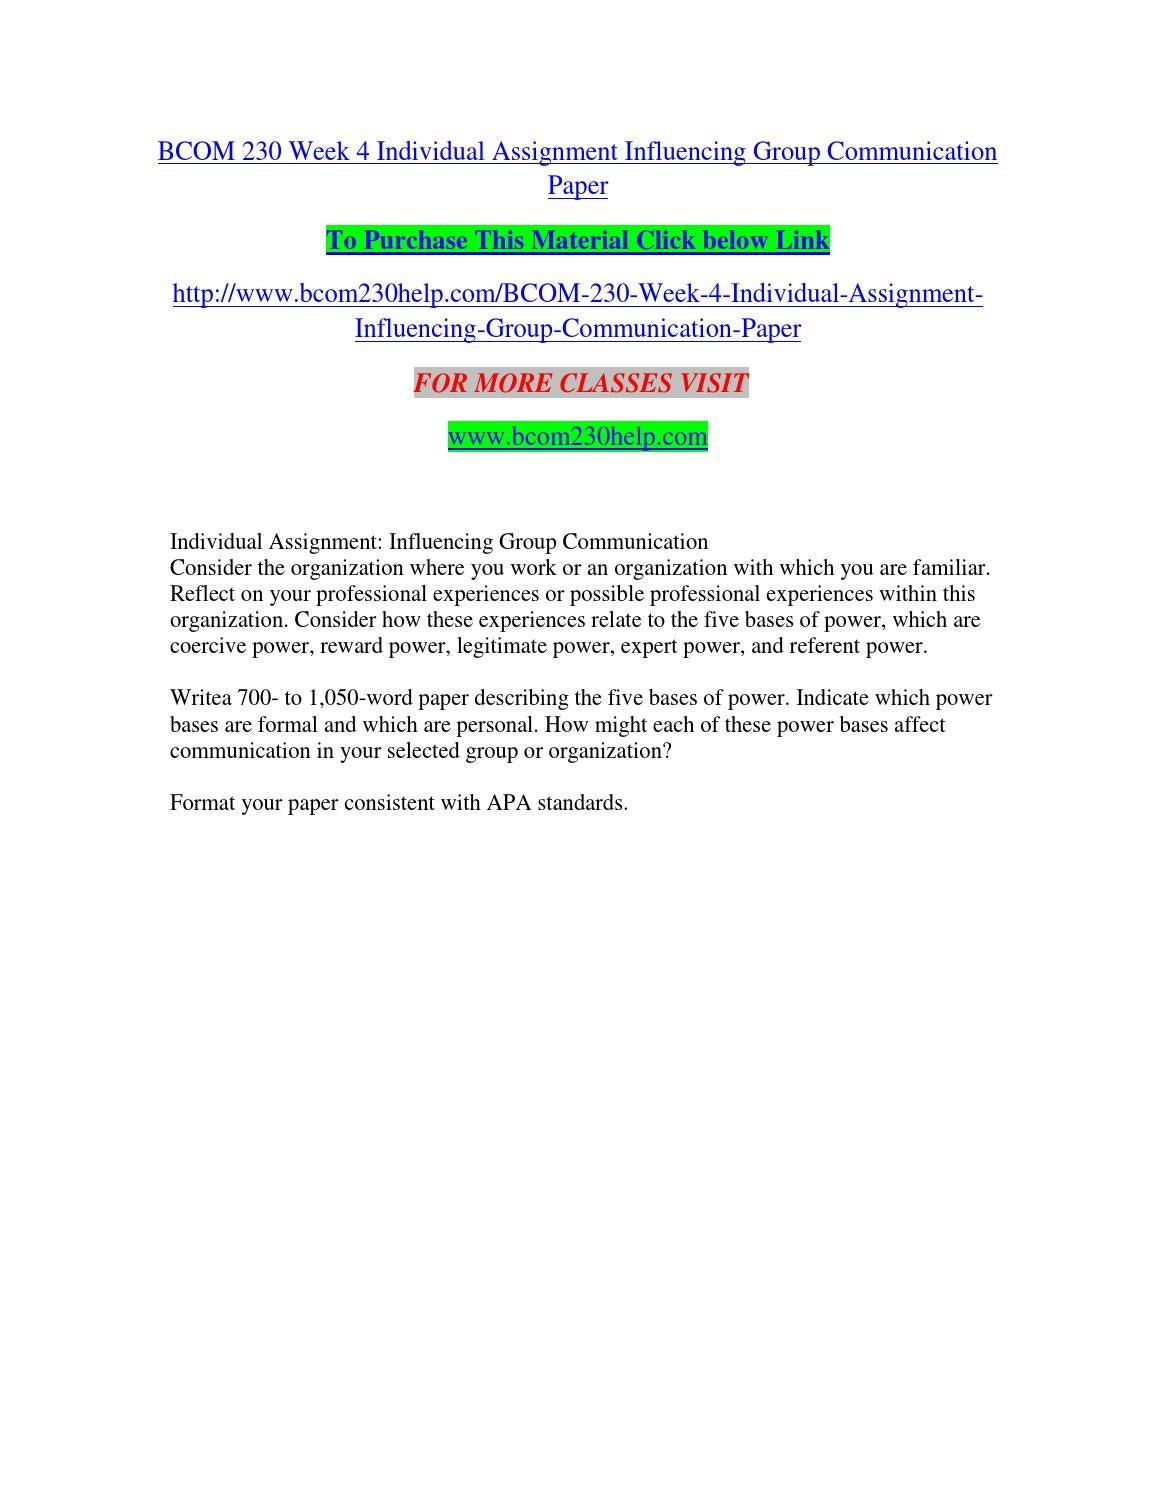 BCOM 230 UOP Course Tutorial / Uoptutorial